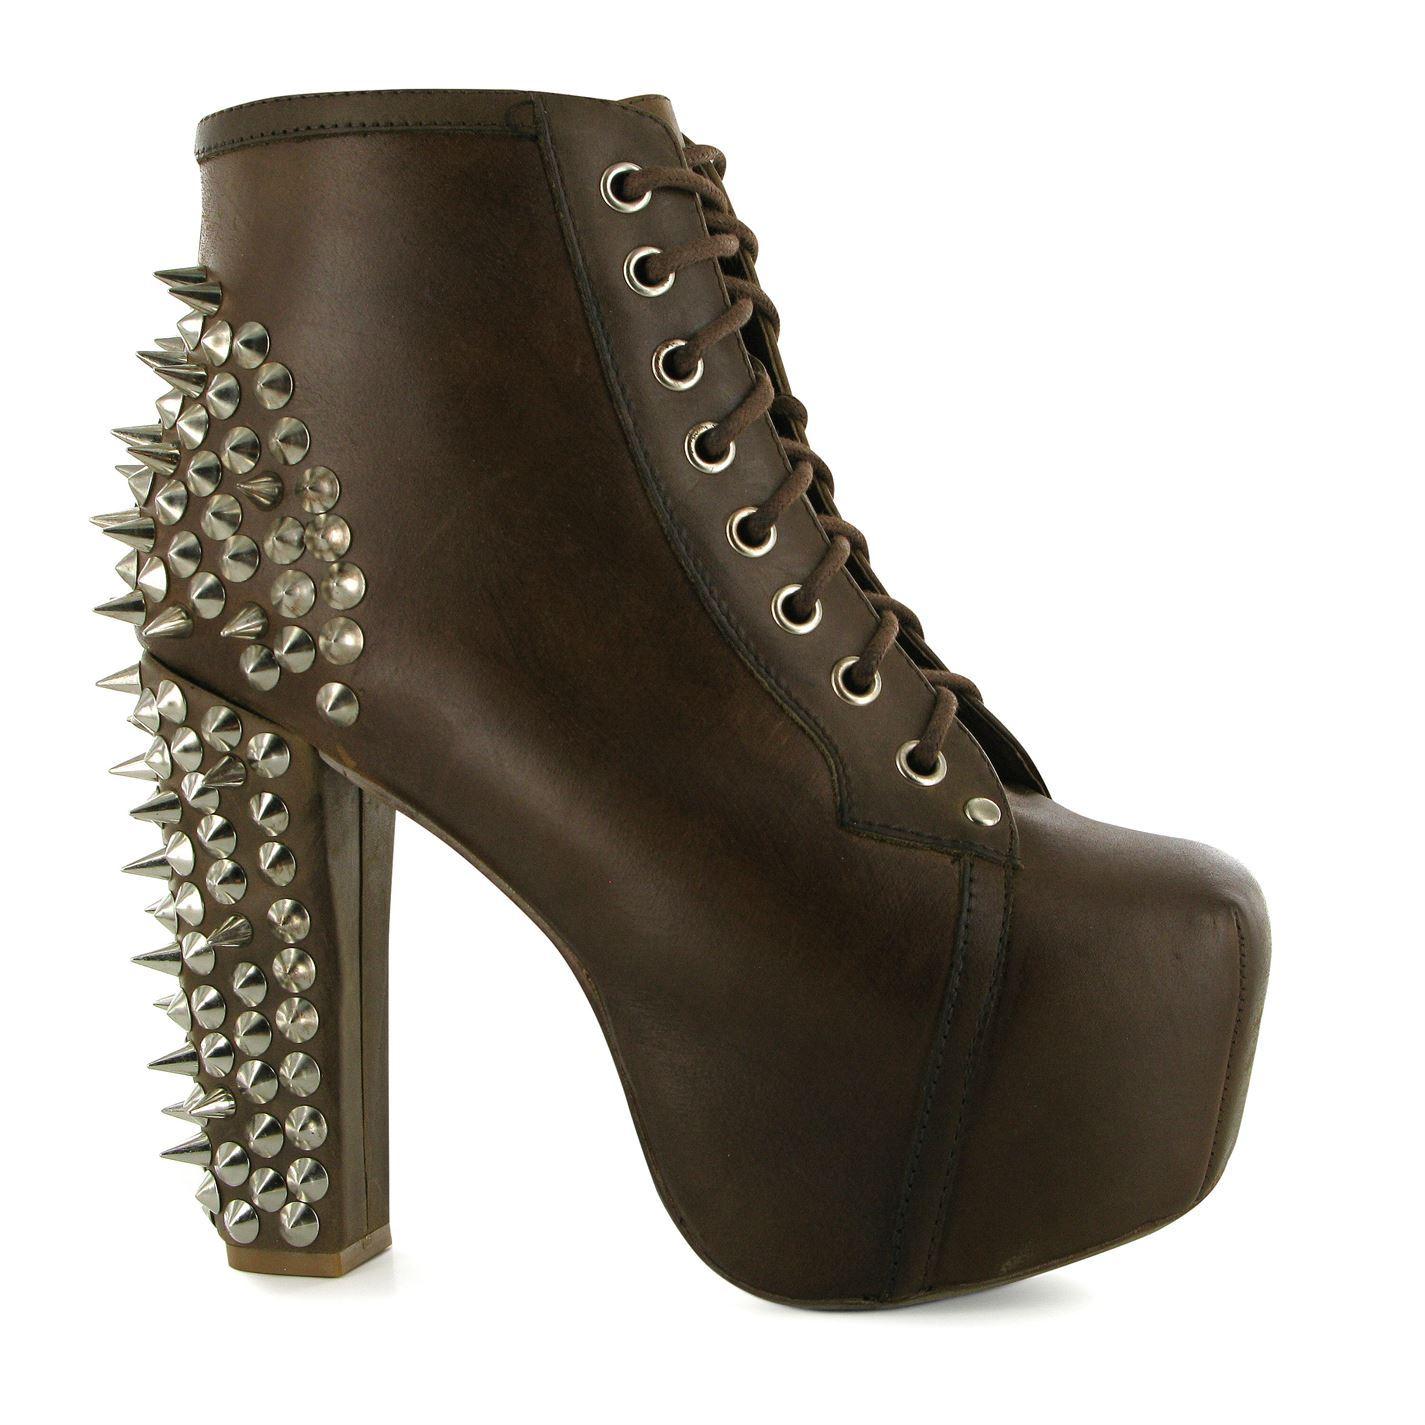 Jeffrey campbell womens lita spike cushioned shoes block heels lace up casual - Jeffrey campbell lita spike ...